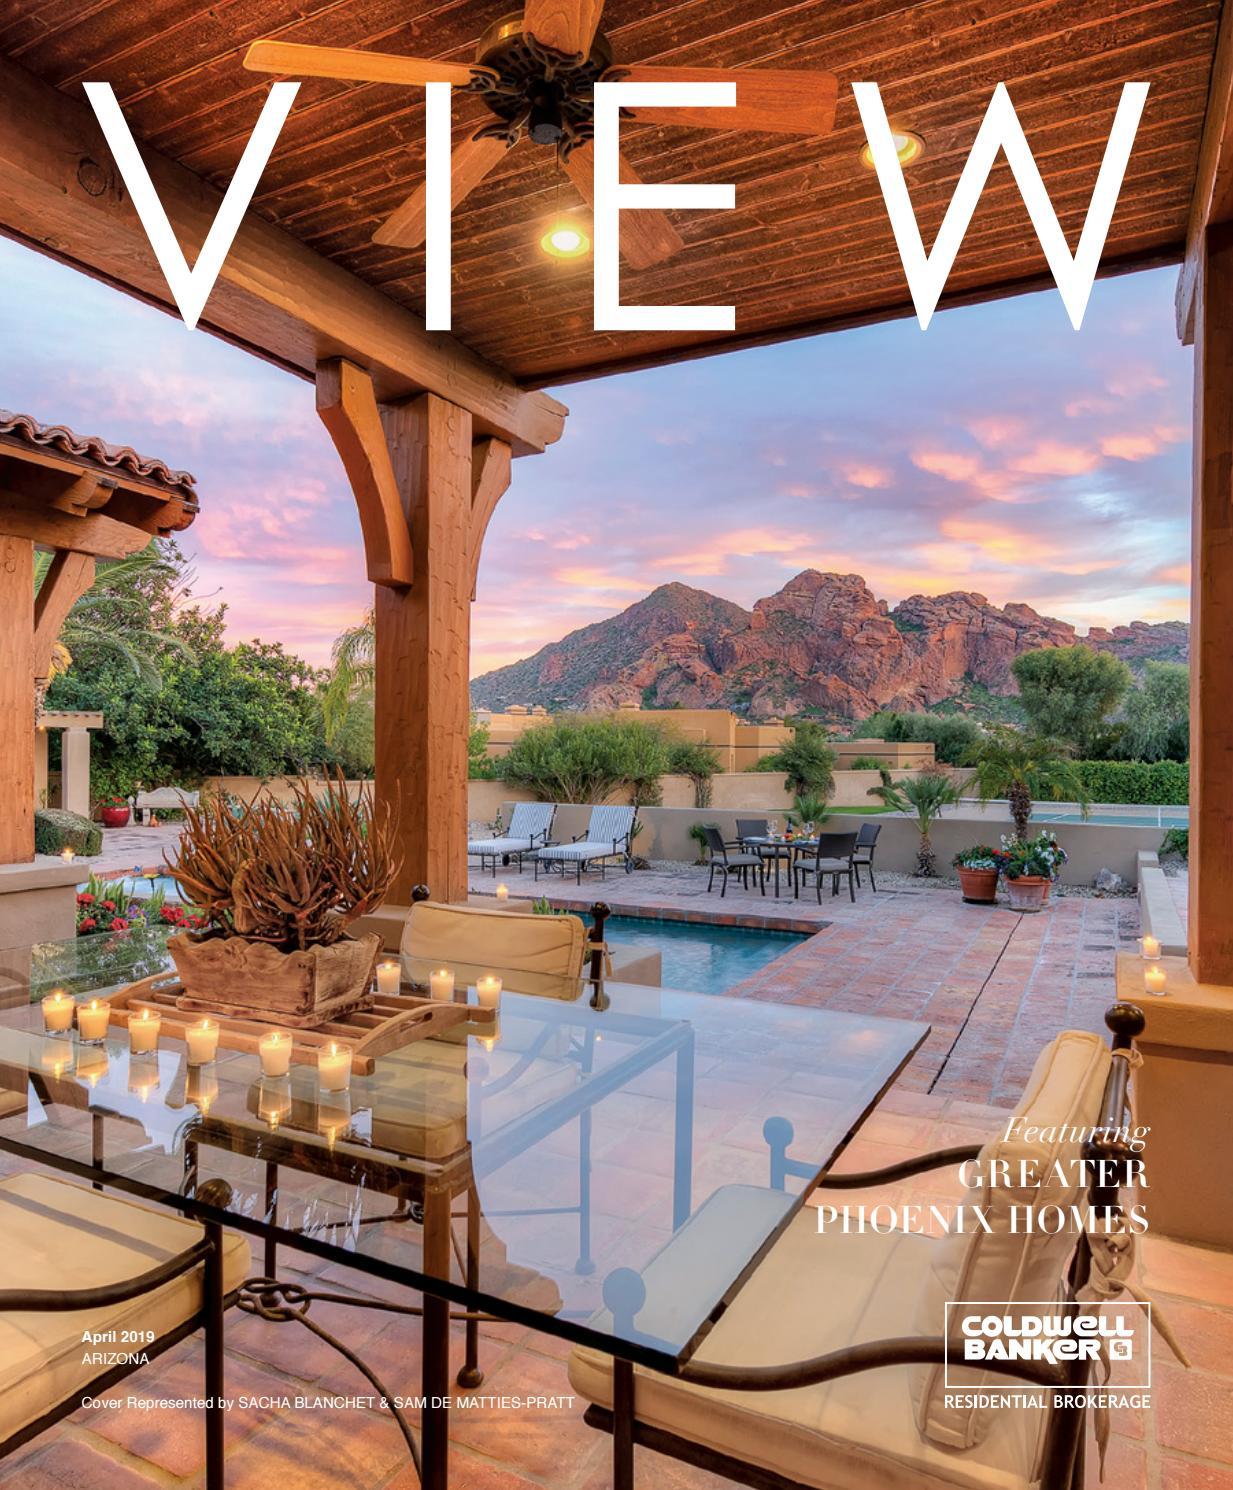 View Arizona Phoenix Edition By Coldwell Banker Issuu